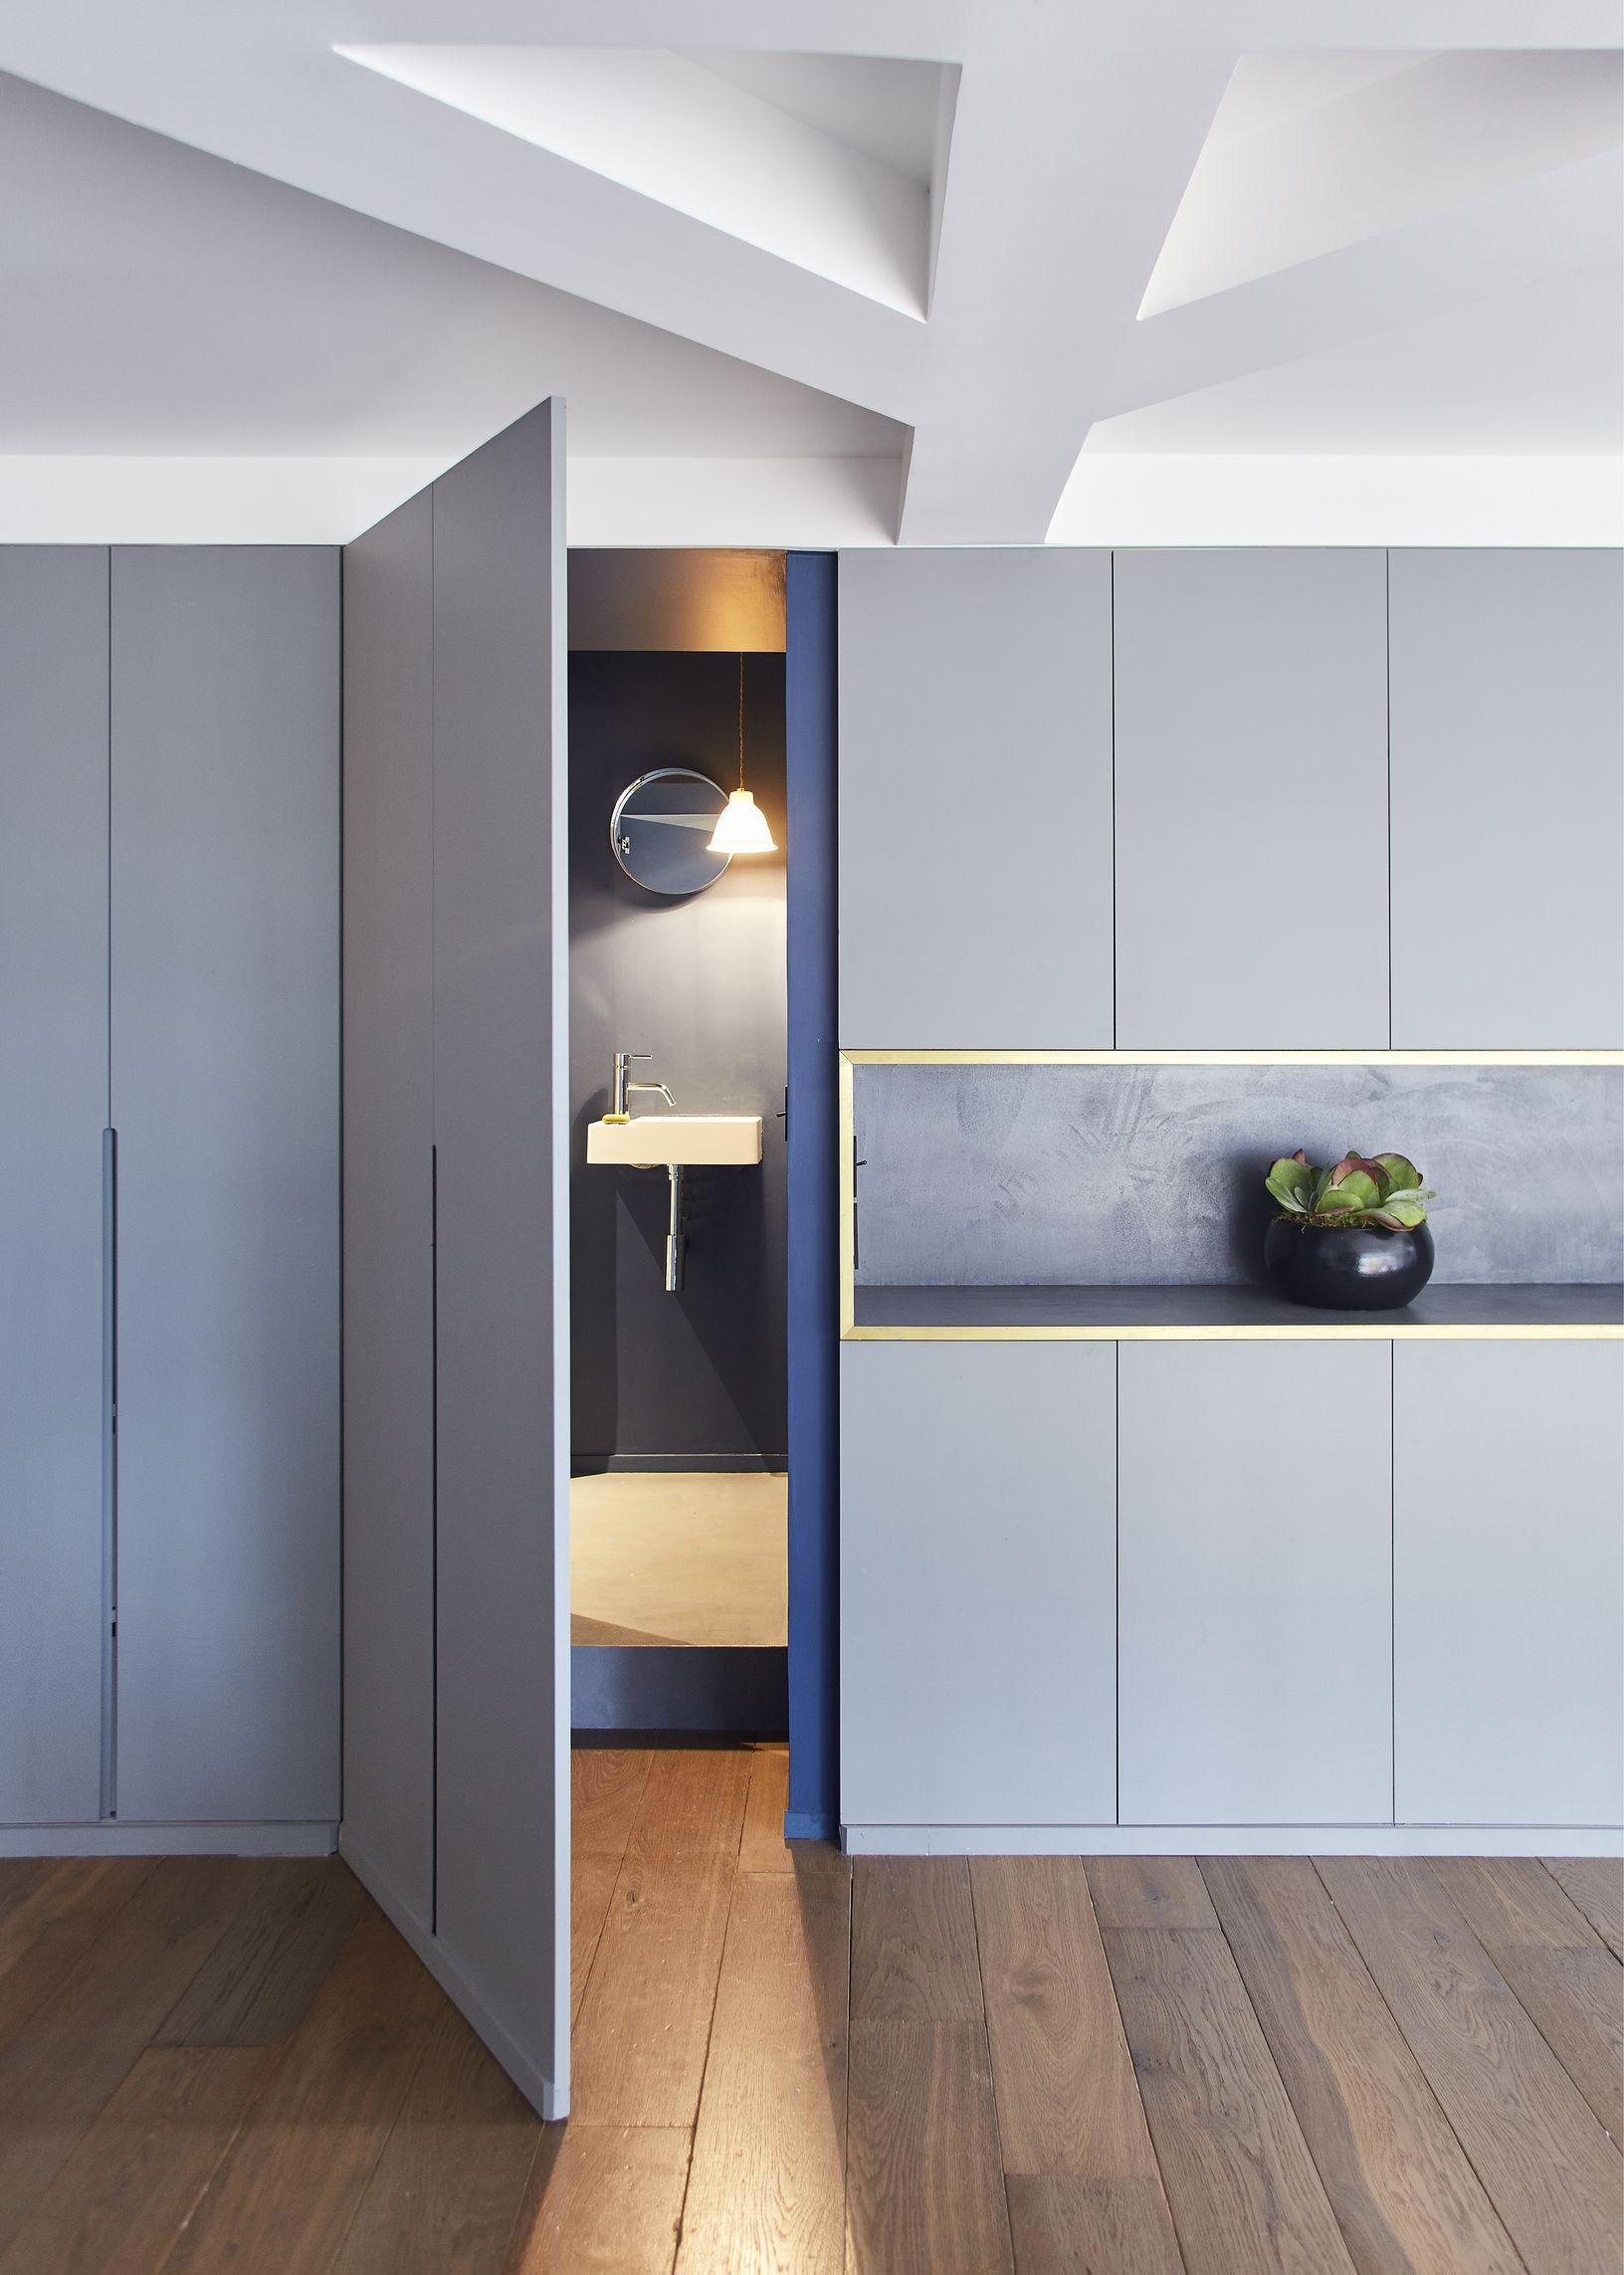 mozart gcg architectes en 2019 salle de bain. Black Bedroom Furniture Sets. Home Design Ideas